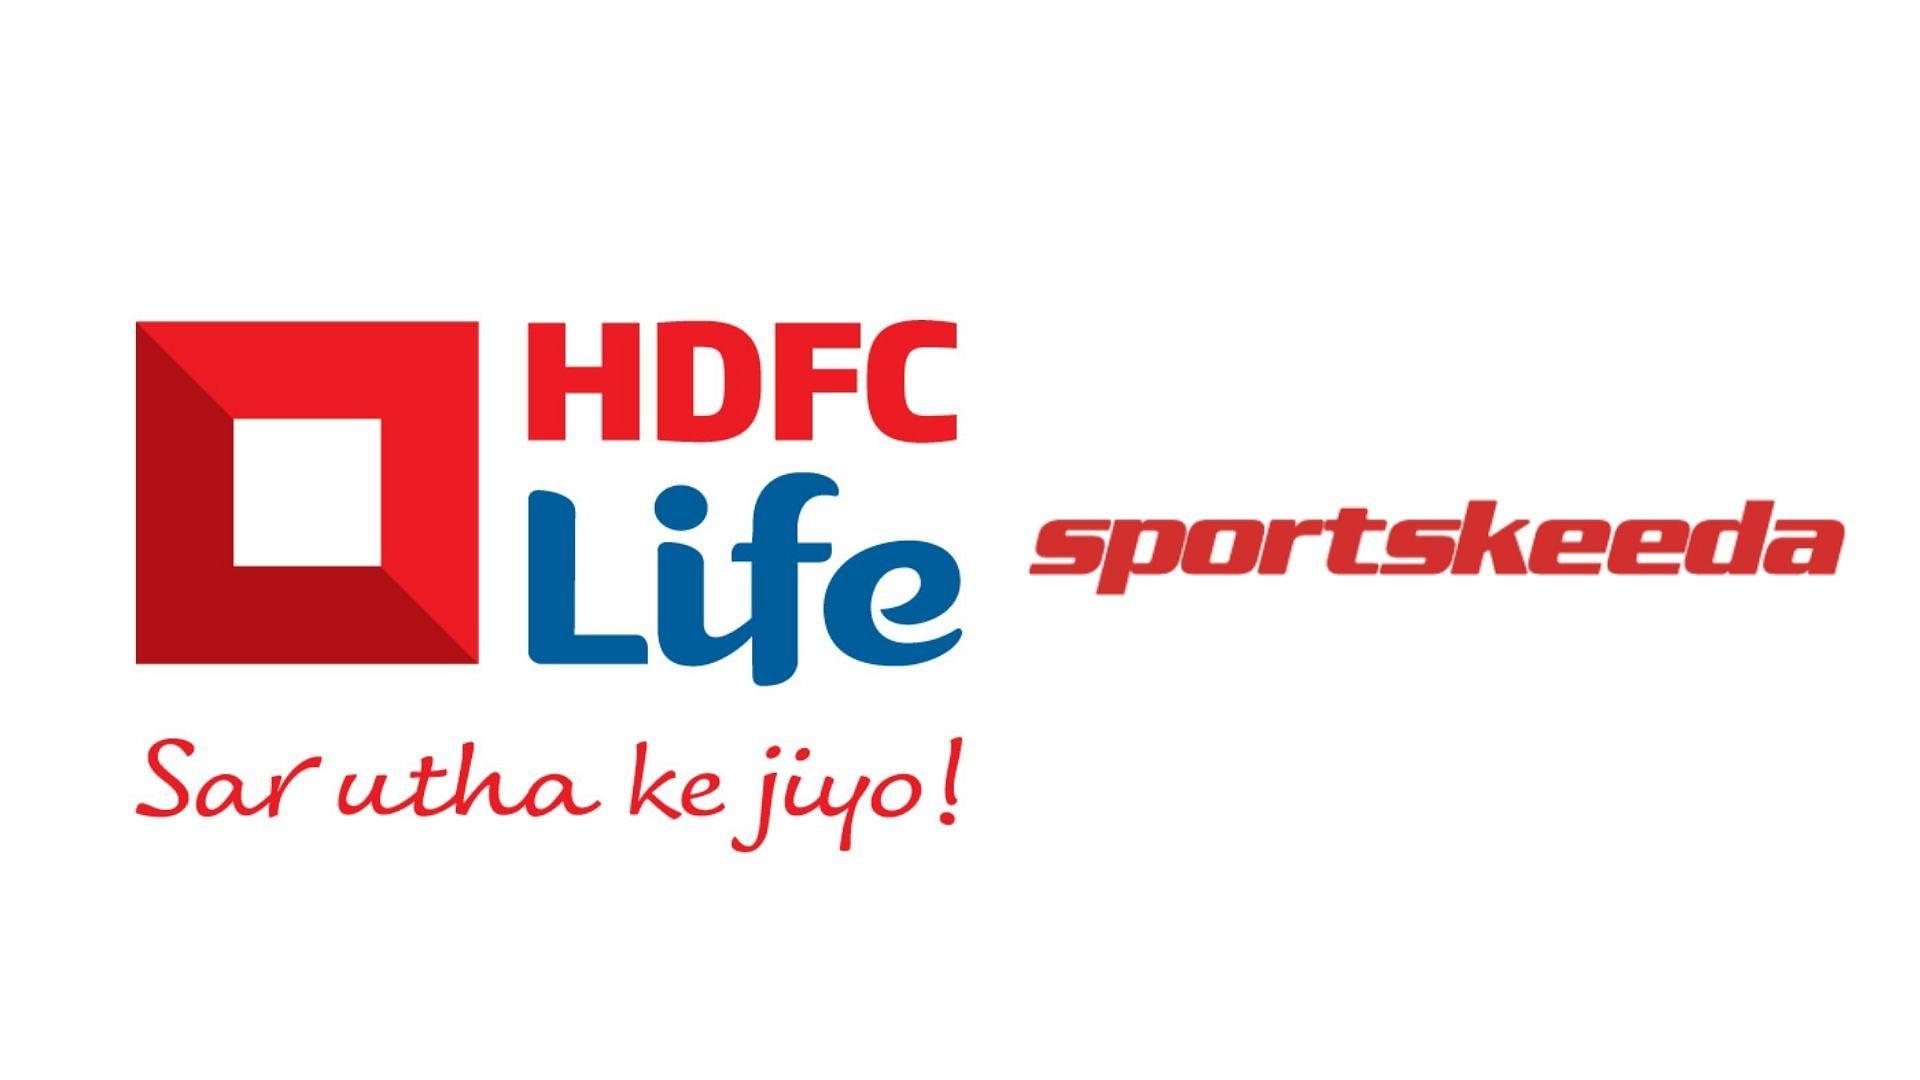 hdfc sportskeeda